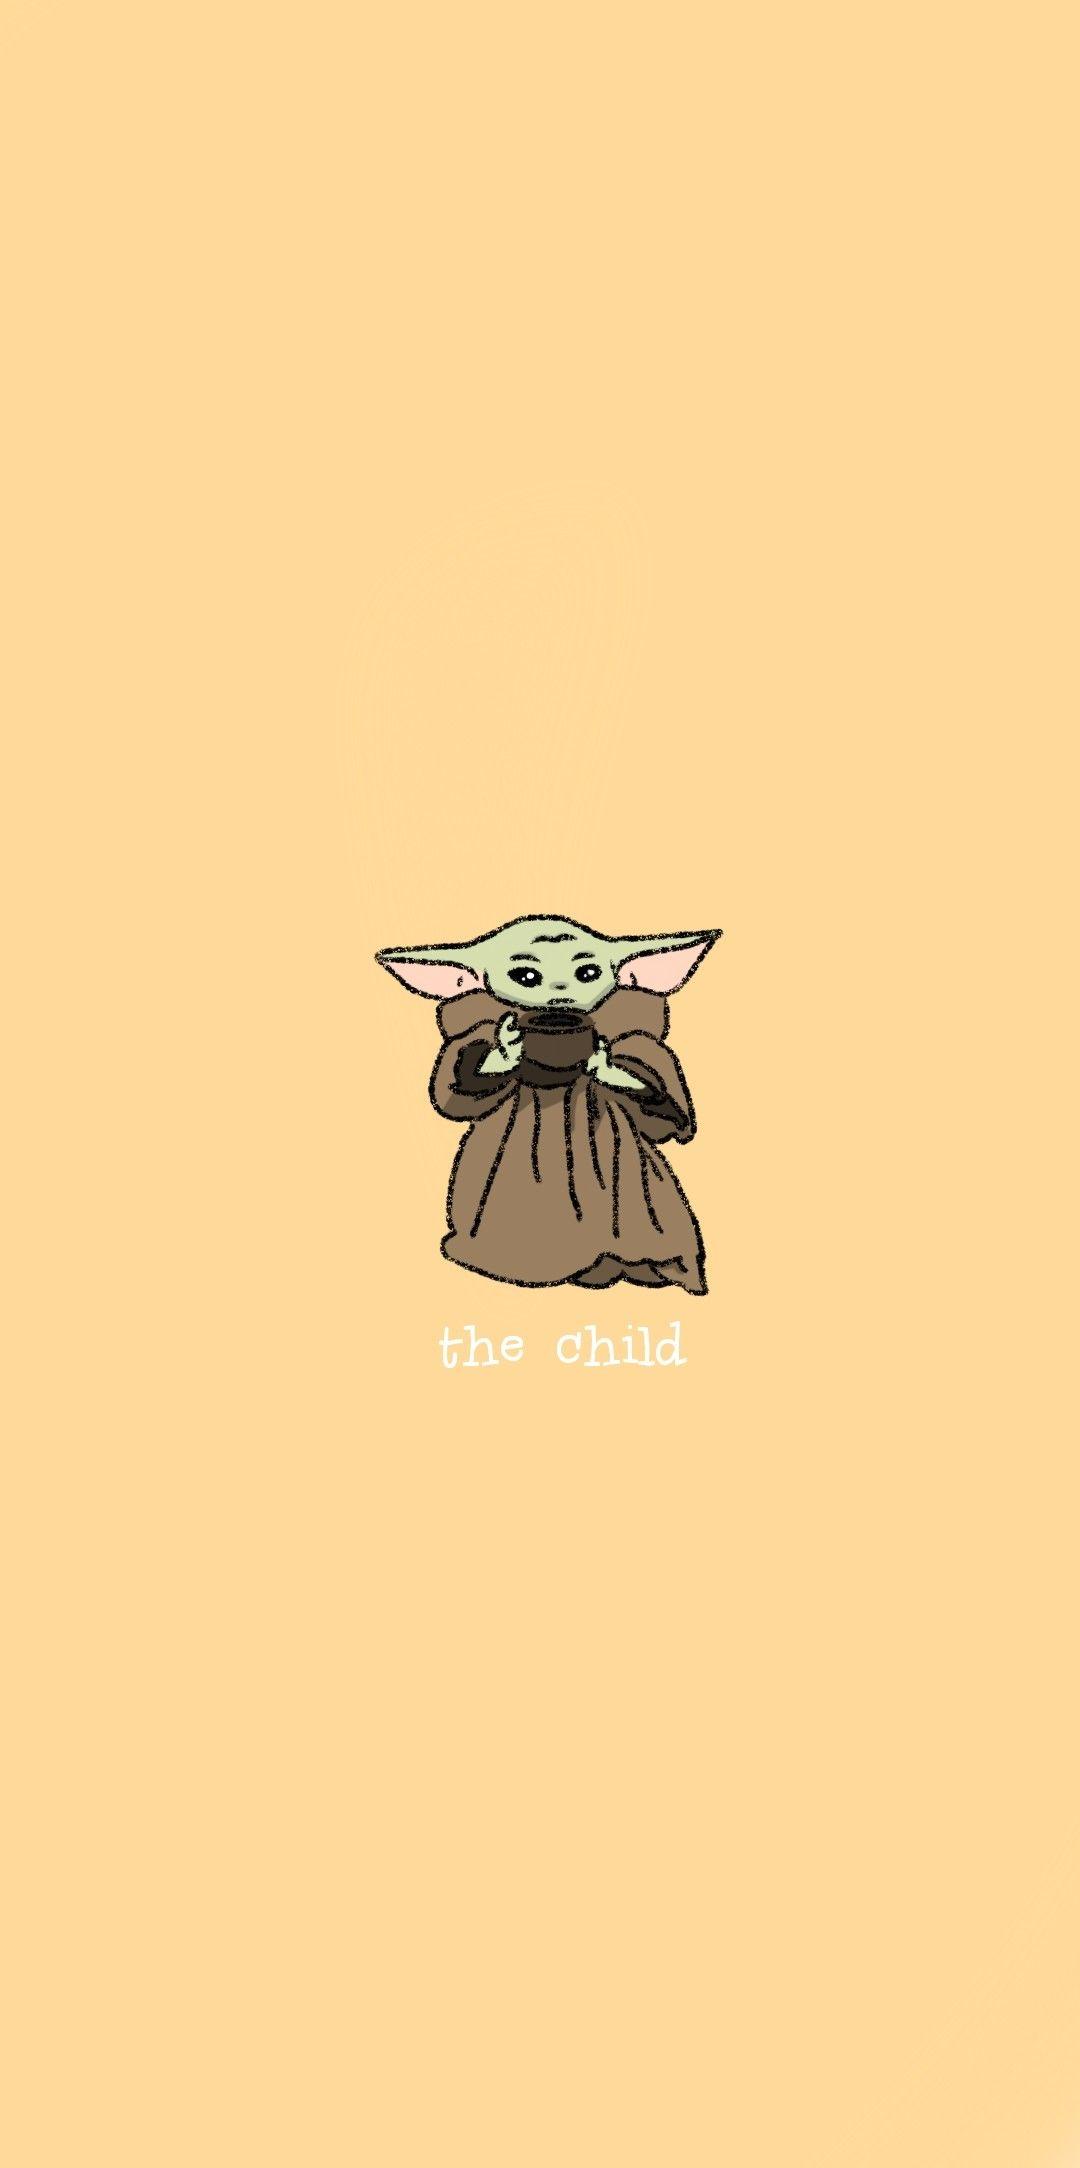 Baby Yoda Wallpaper In 2020 Yoda Wallpaper Custom Wallpaper Cartoon Wallpaper Iphone